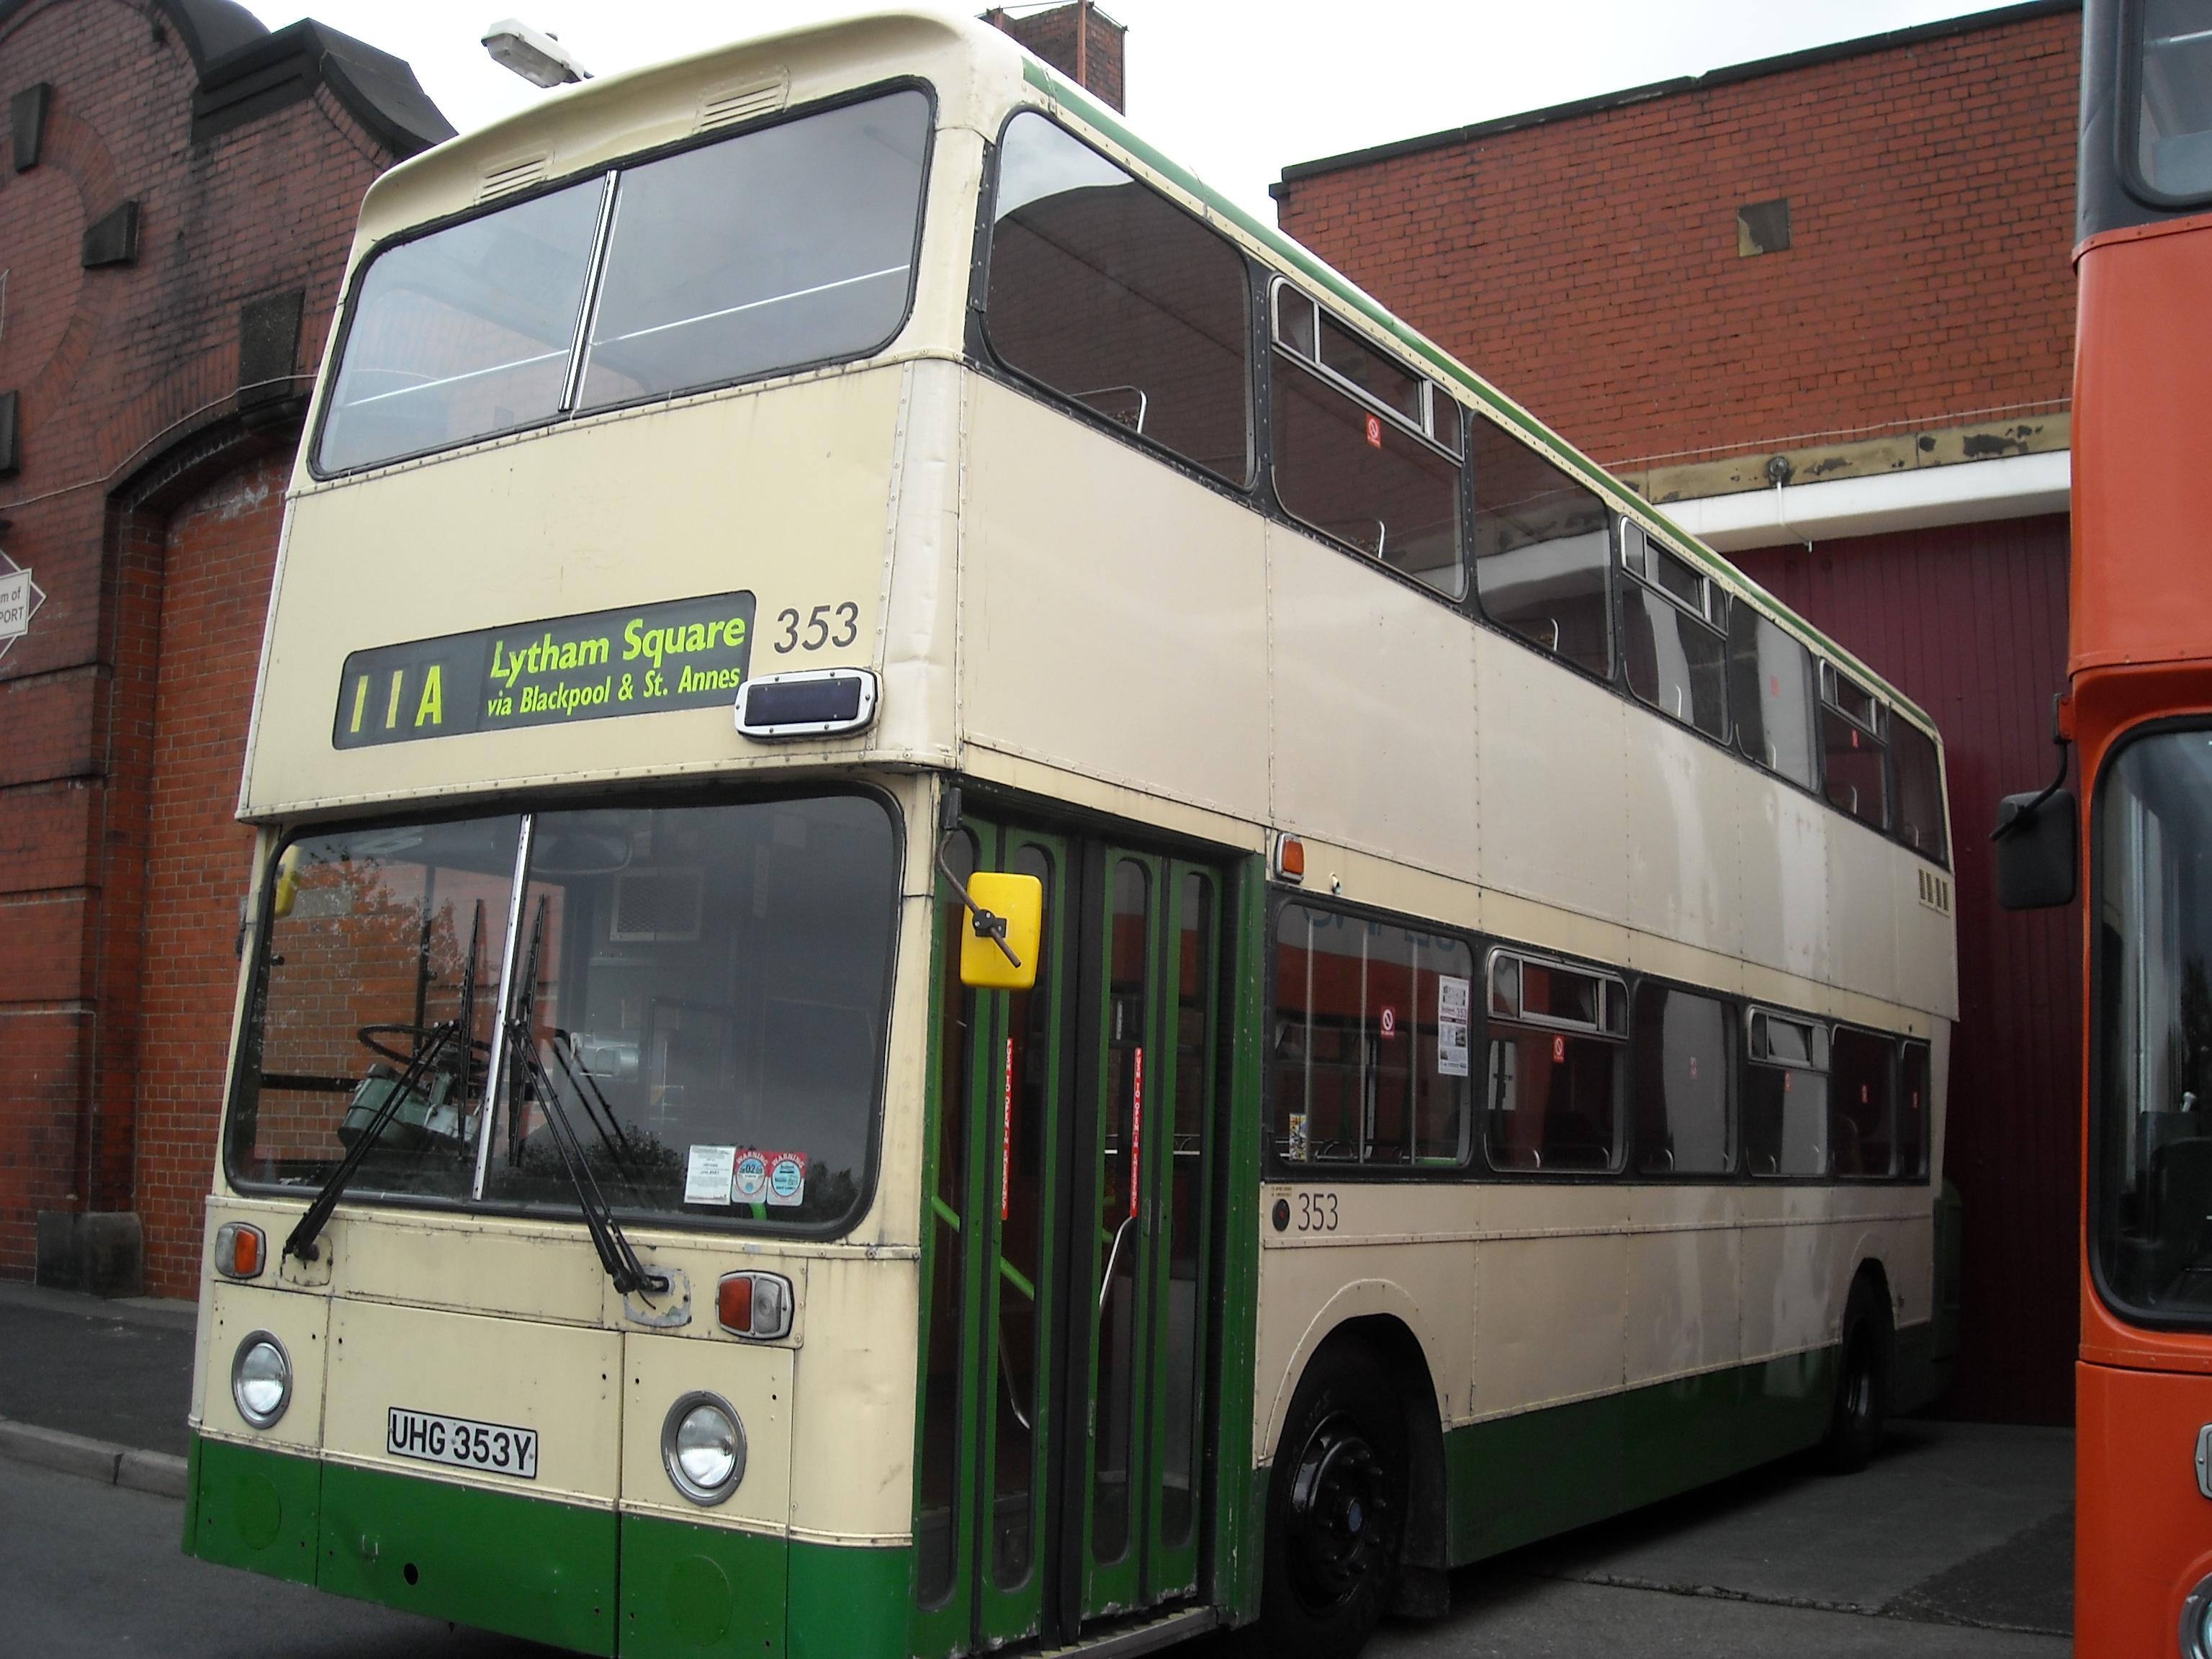 File:Blackpool Transport preserved bus UHG 353Y.jpg - Wikimedia ...